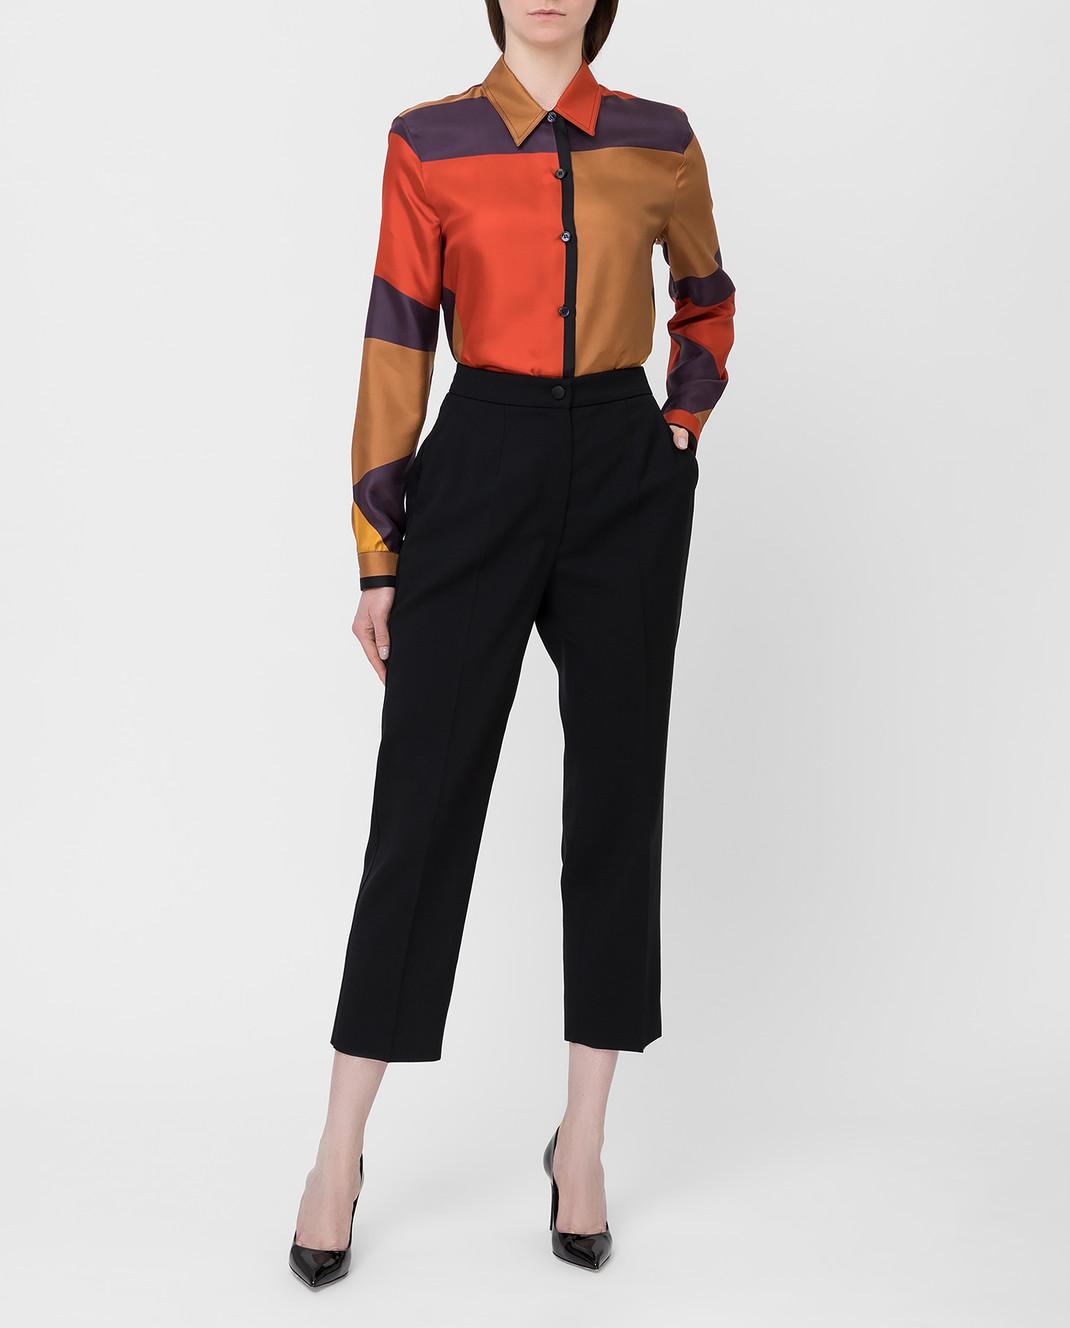 Bottega Veneta Коричневая рубашка из шелка 538599 изображение 2